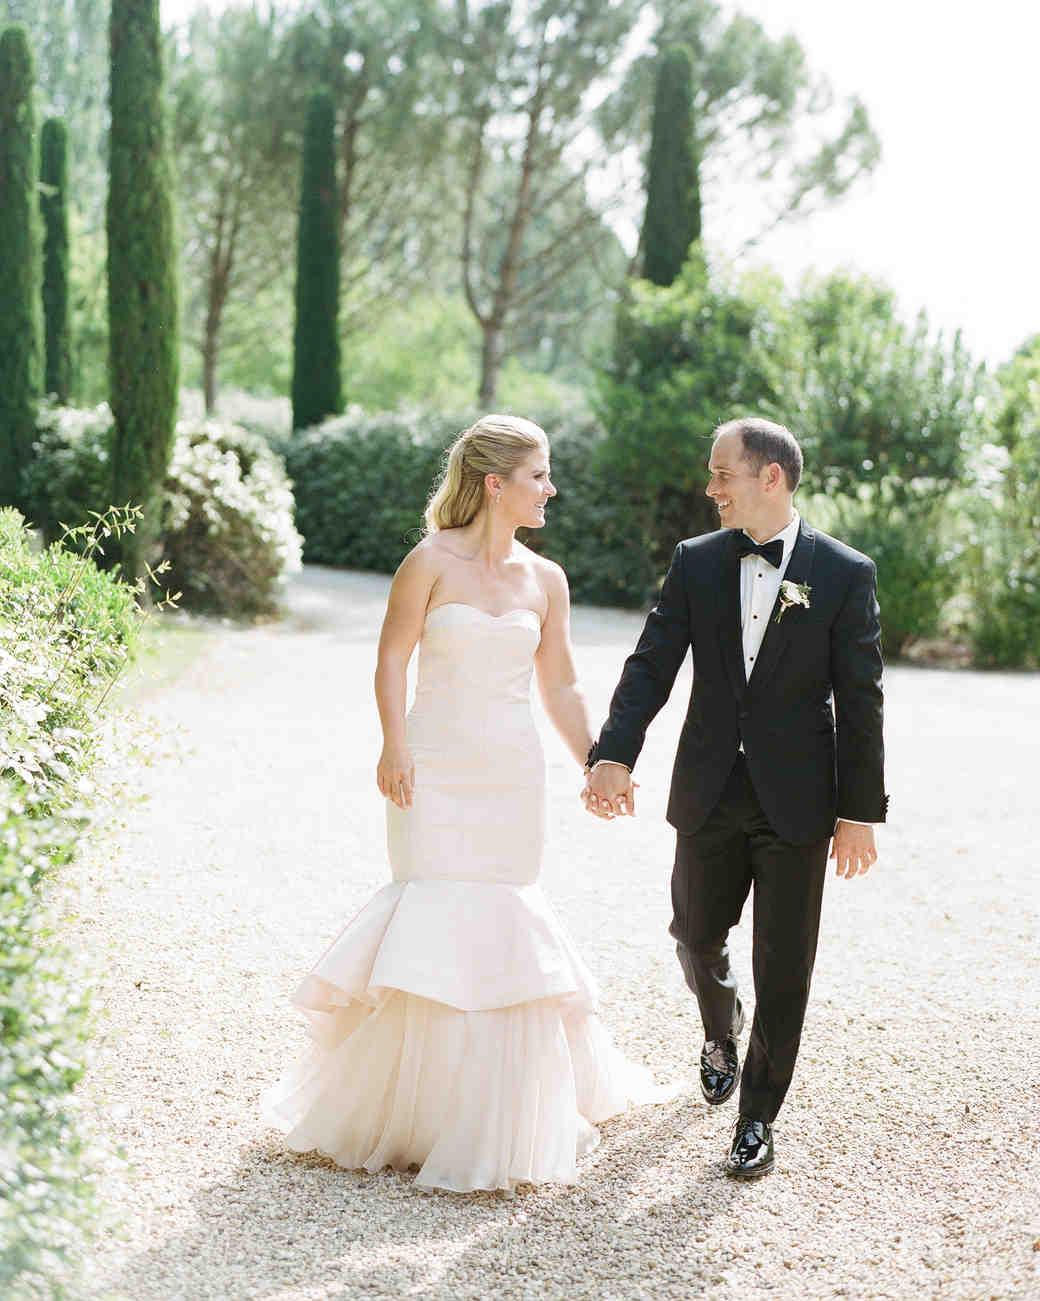 julie-chris-wedding-couple-0772-s12649-0216.jpg